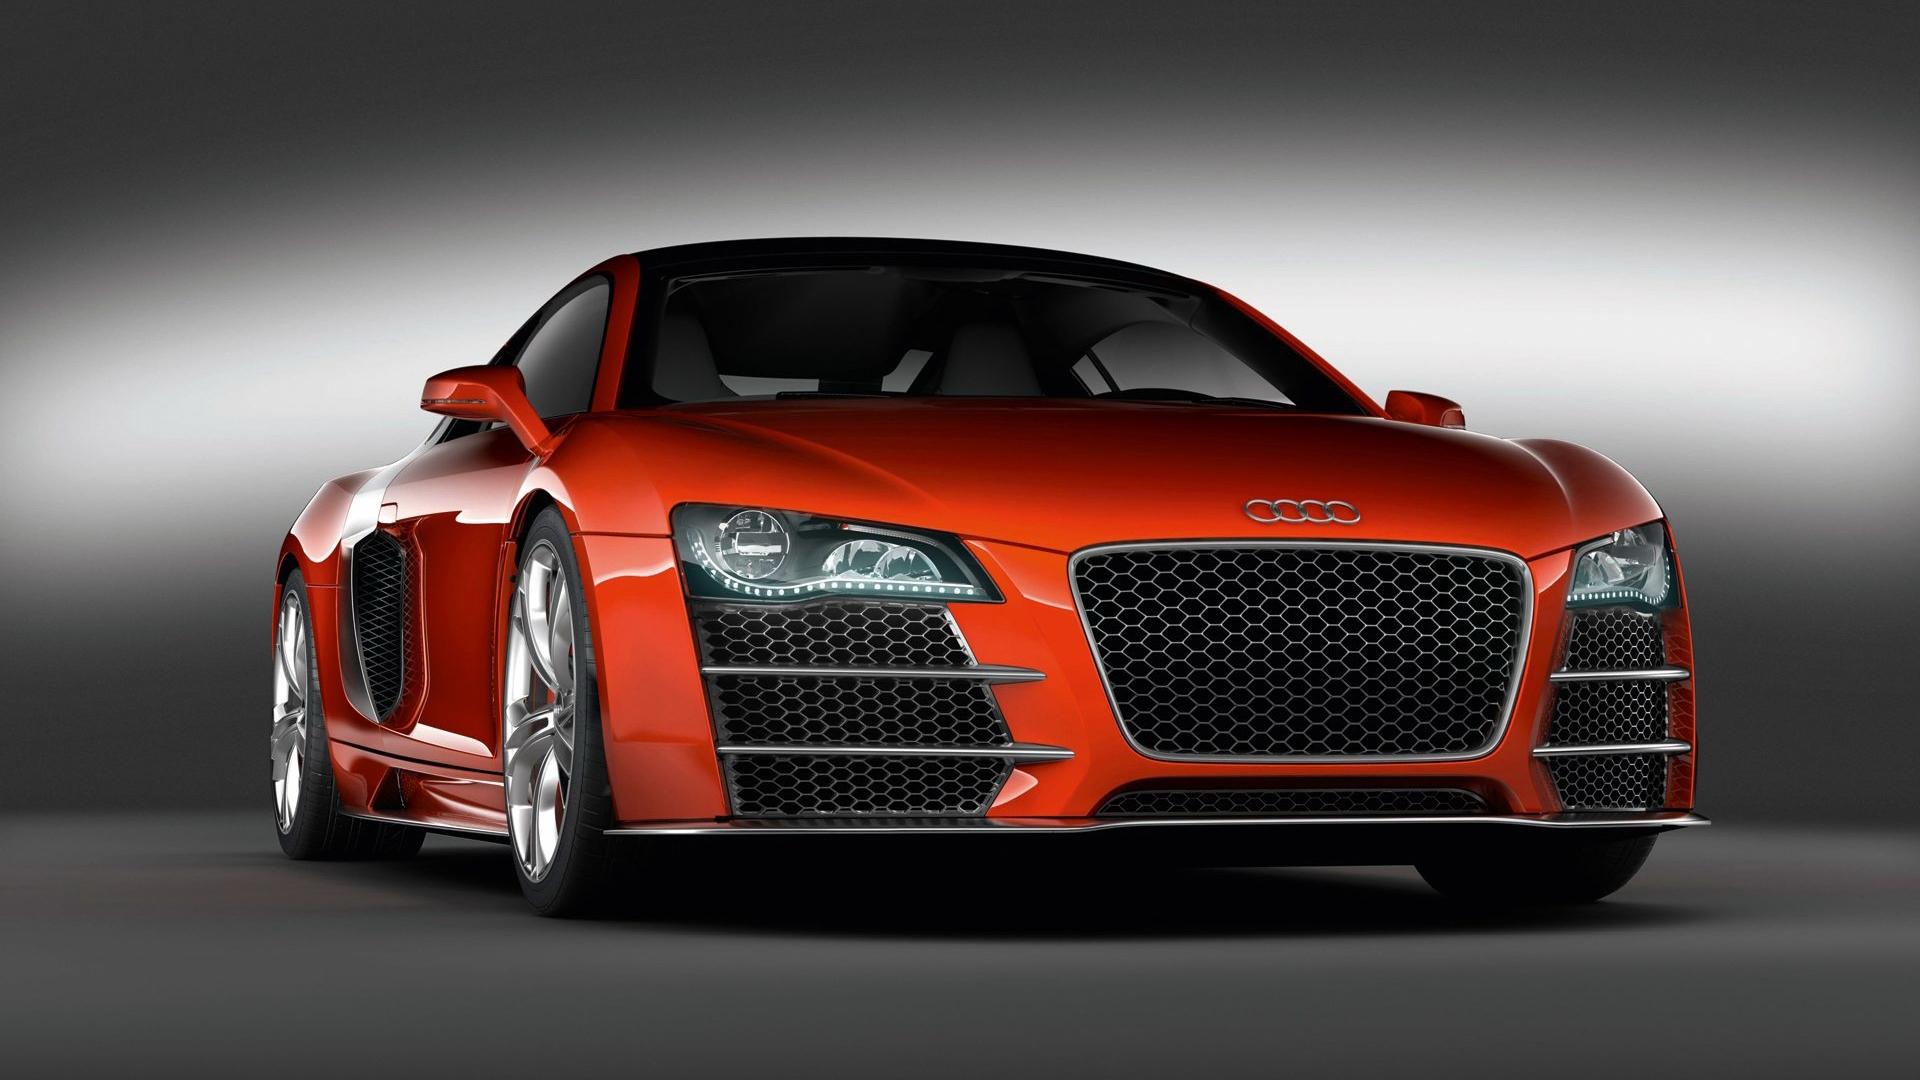 HD Wallpapers Audi R8 HDTV